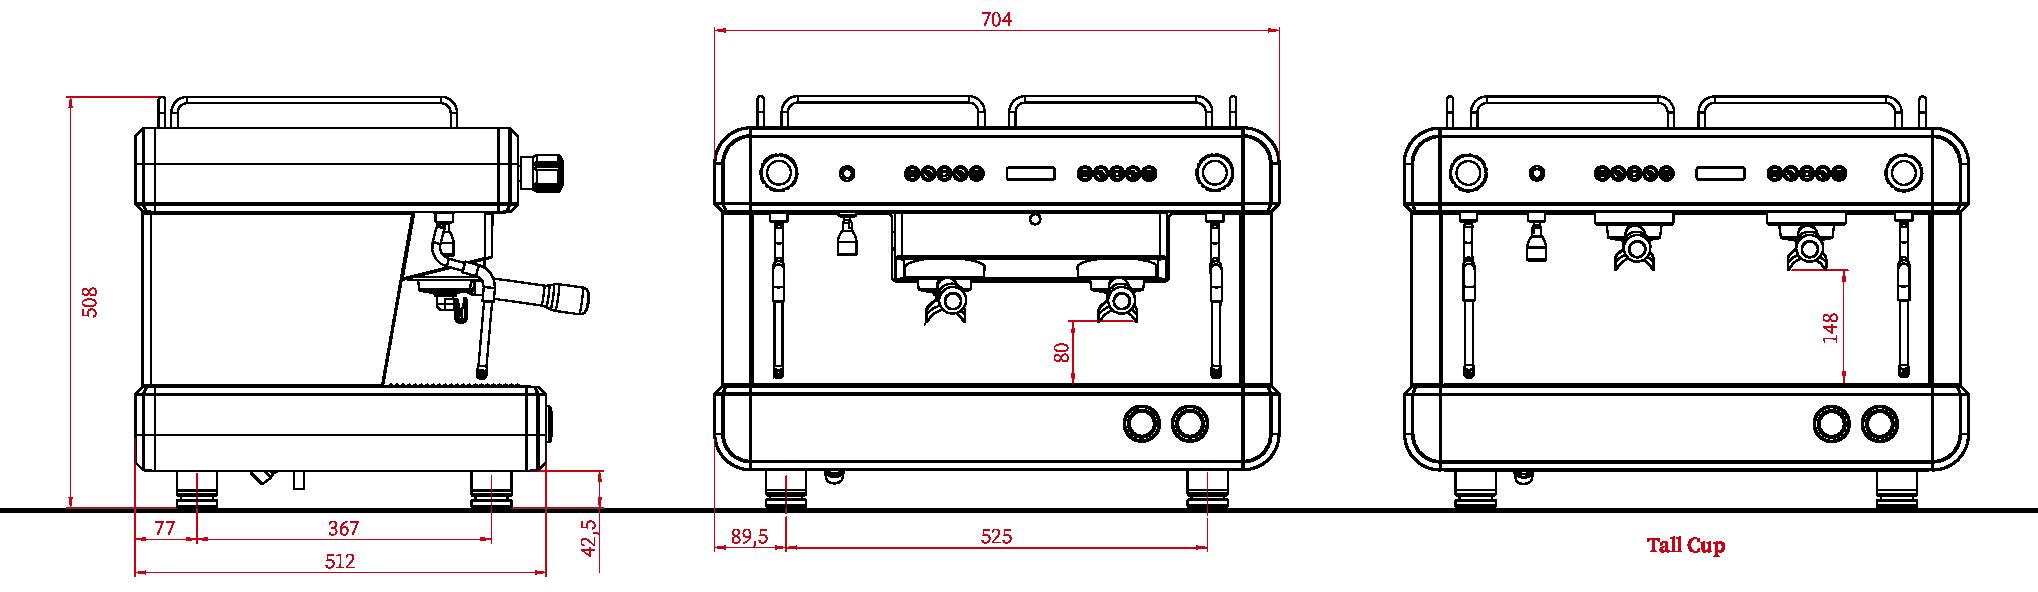 CC202 Technical Drawing